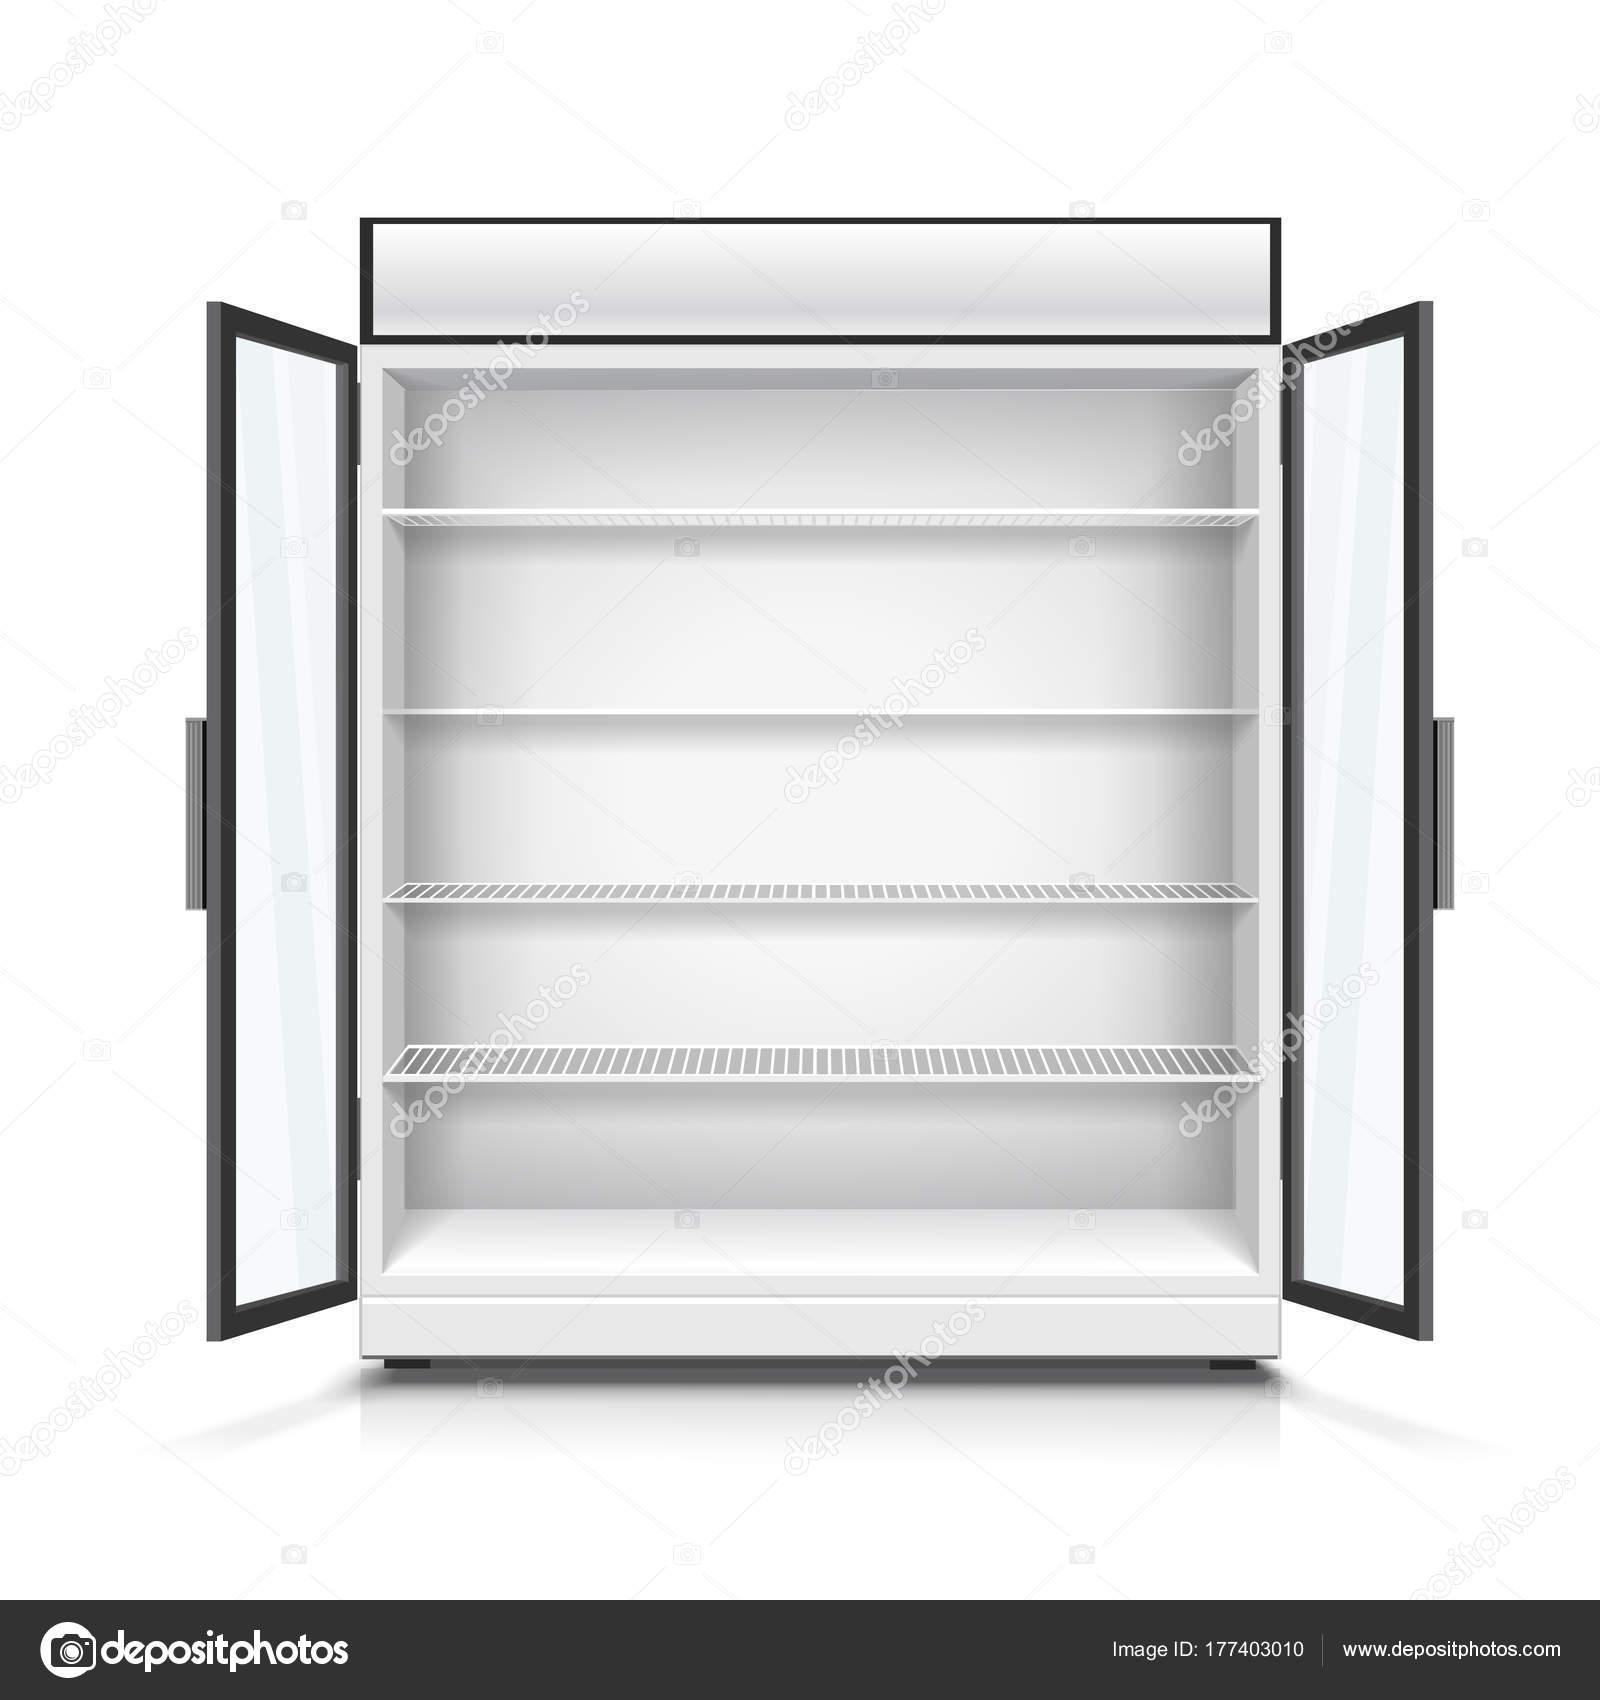 empty commercial fridge with shelves 3d illustration stock photo